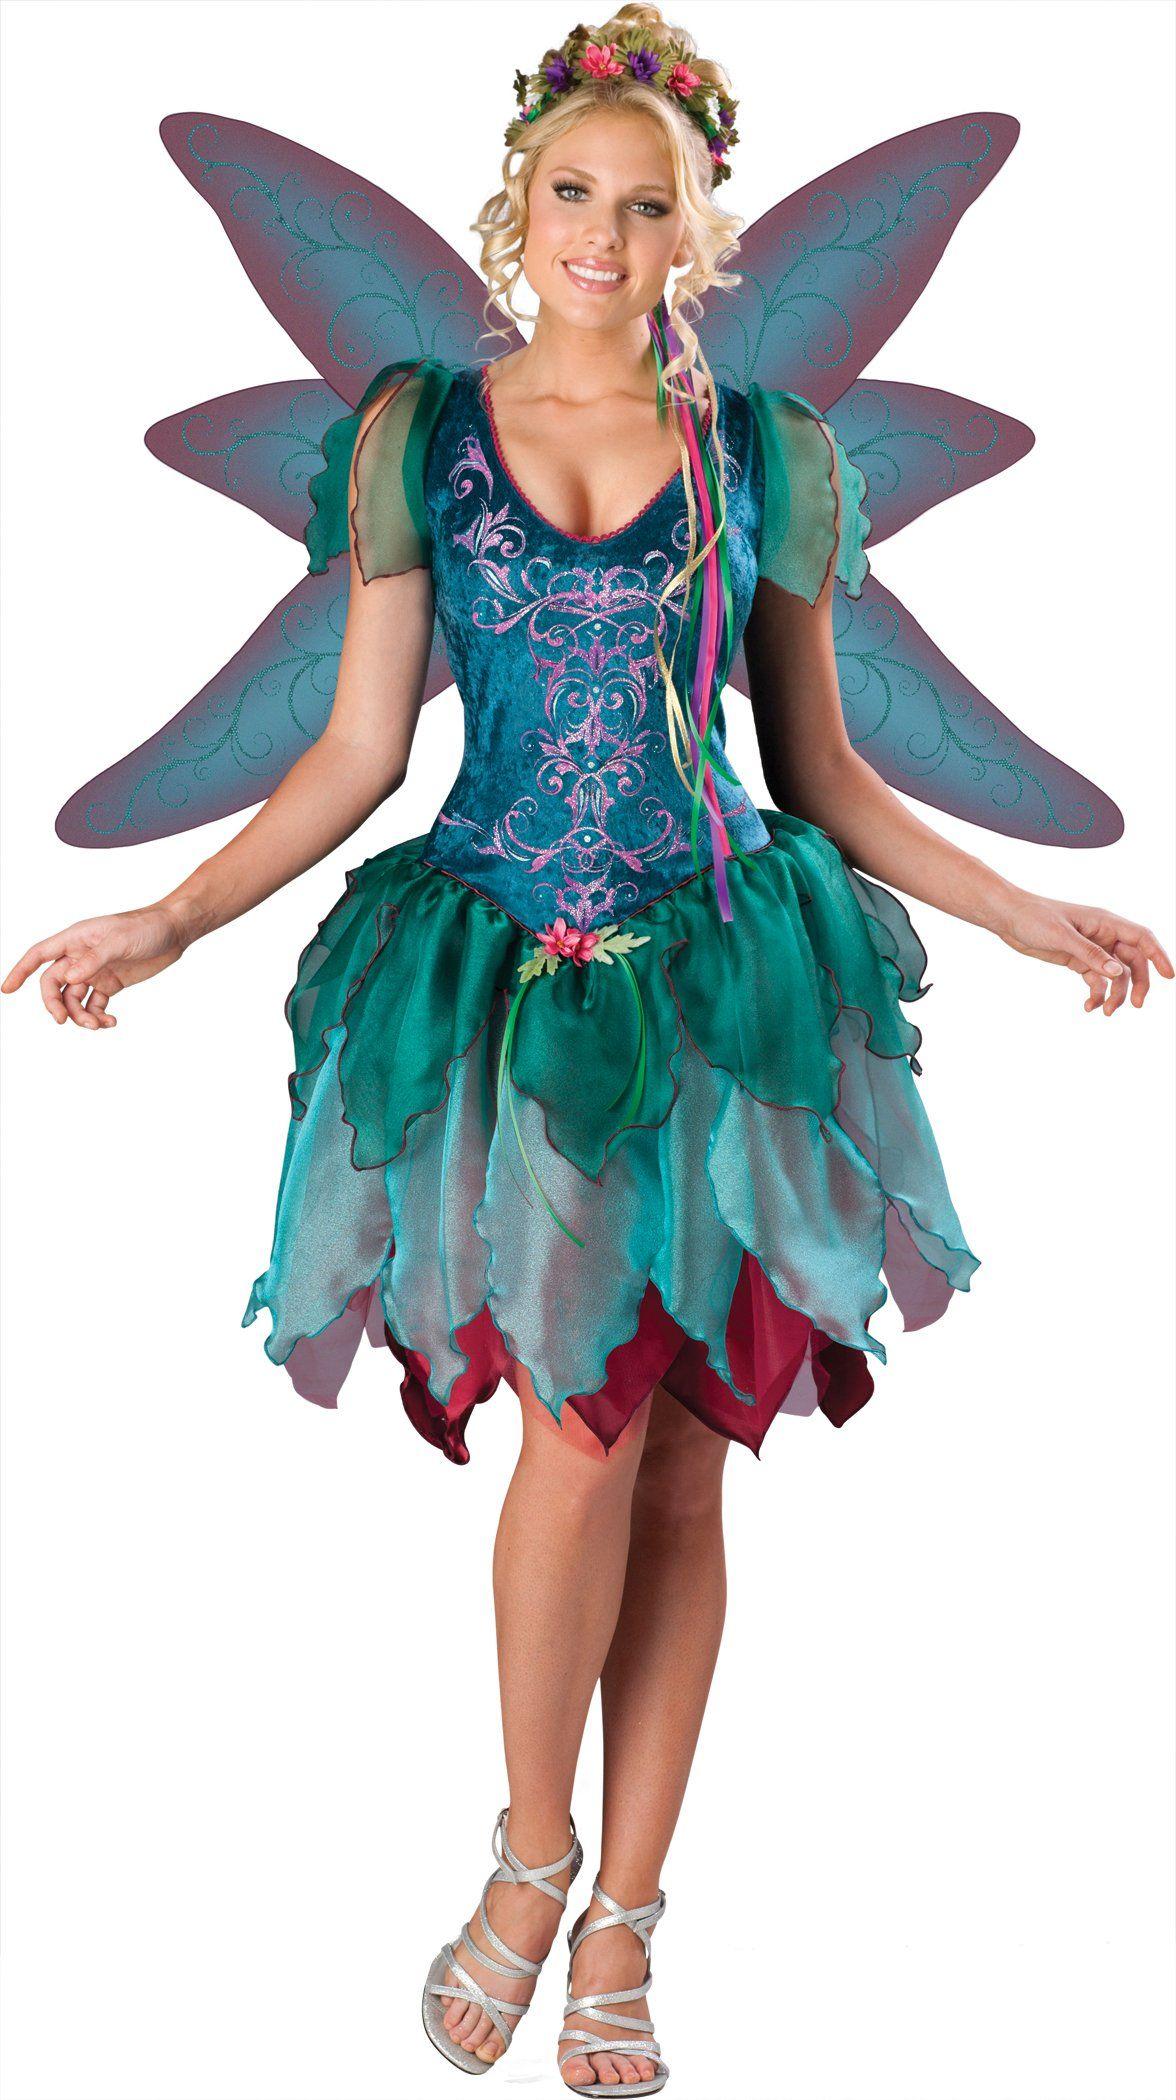 Enchanted Faerie Elite Adult Costume  be5c7ab1f9f5